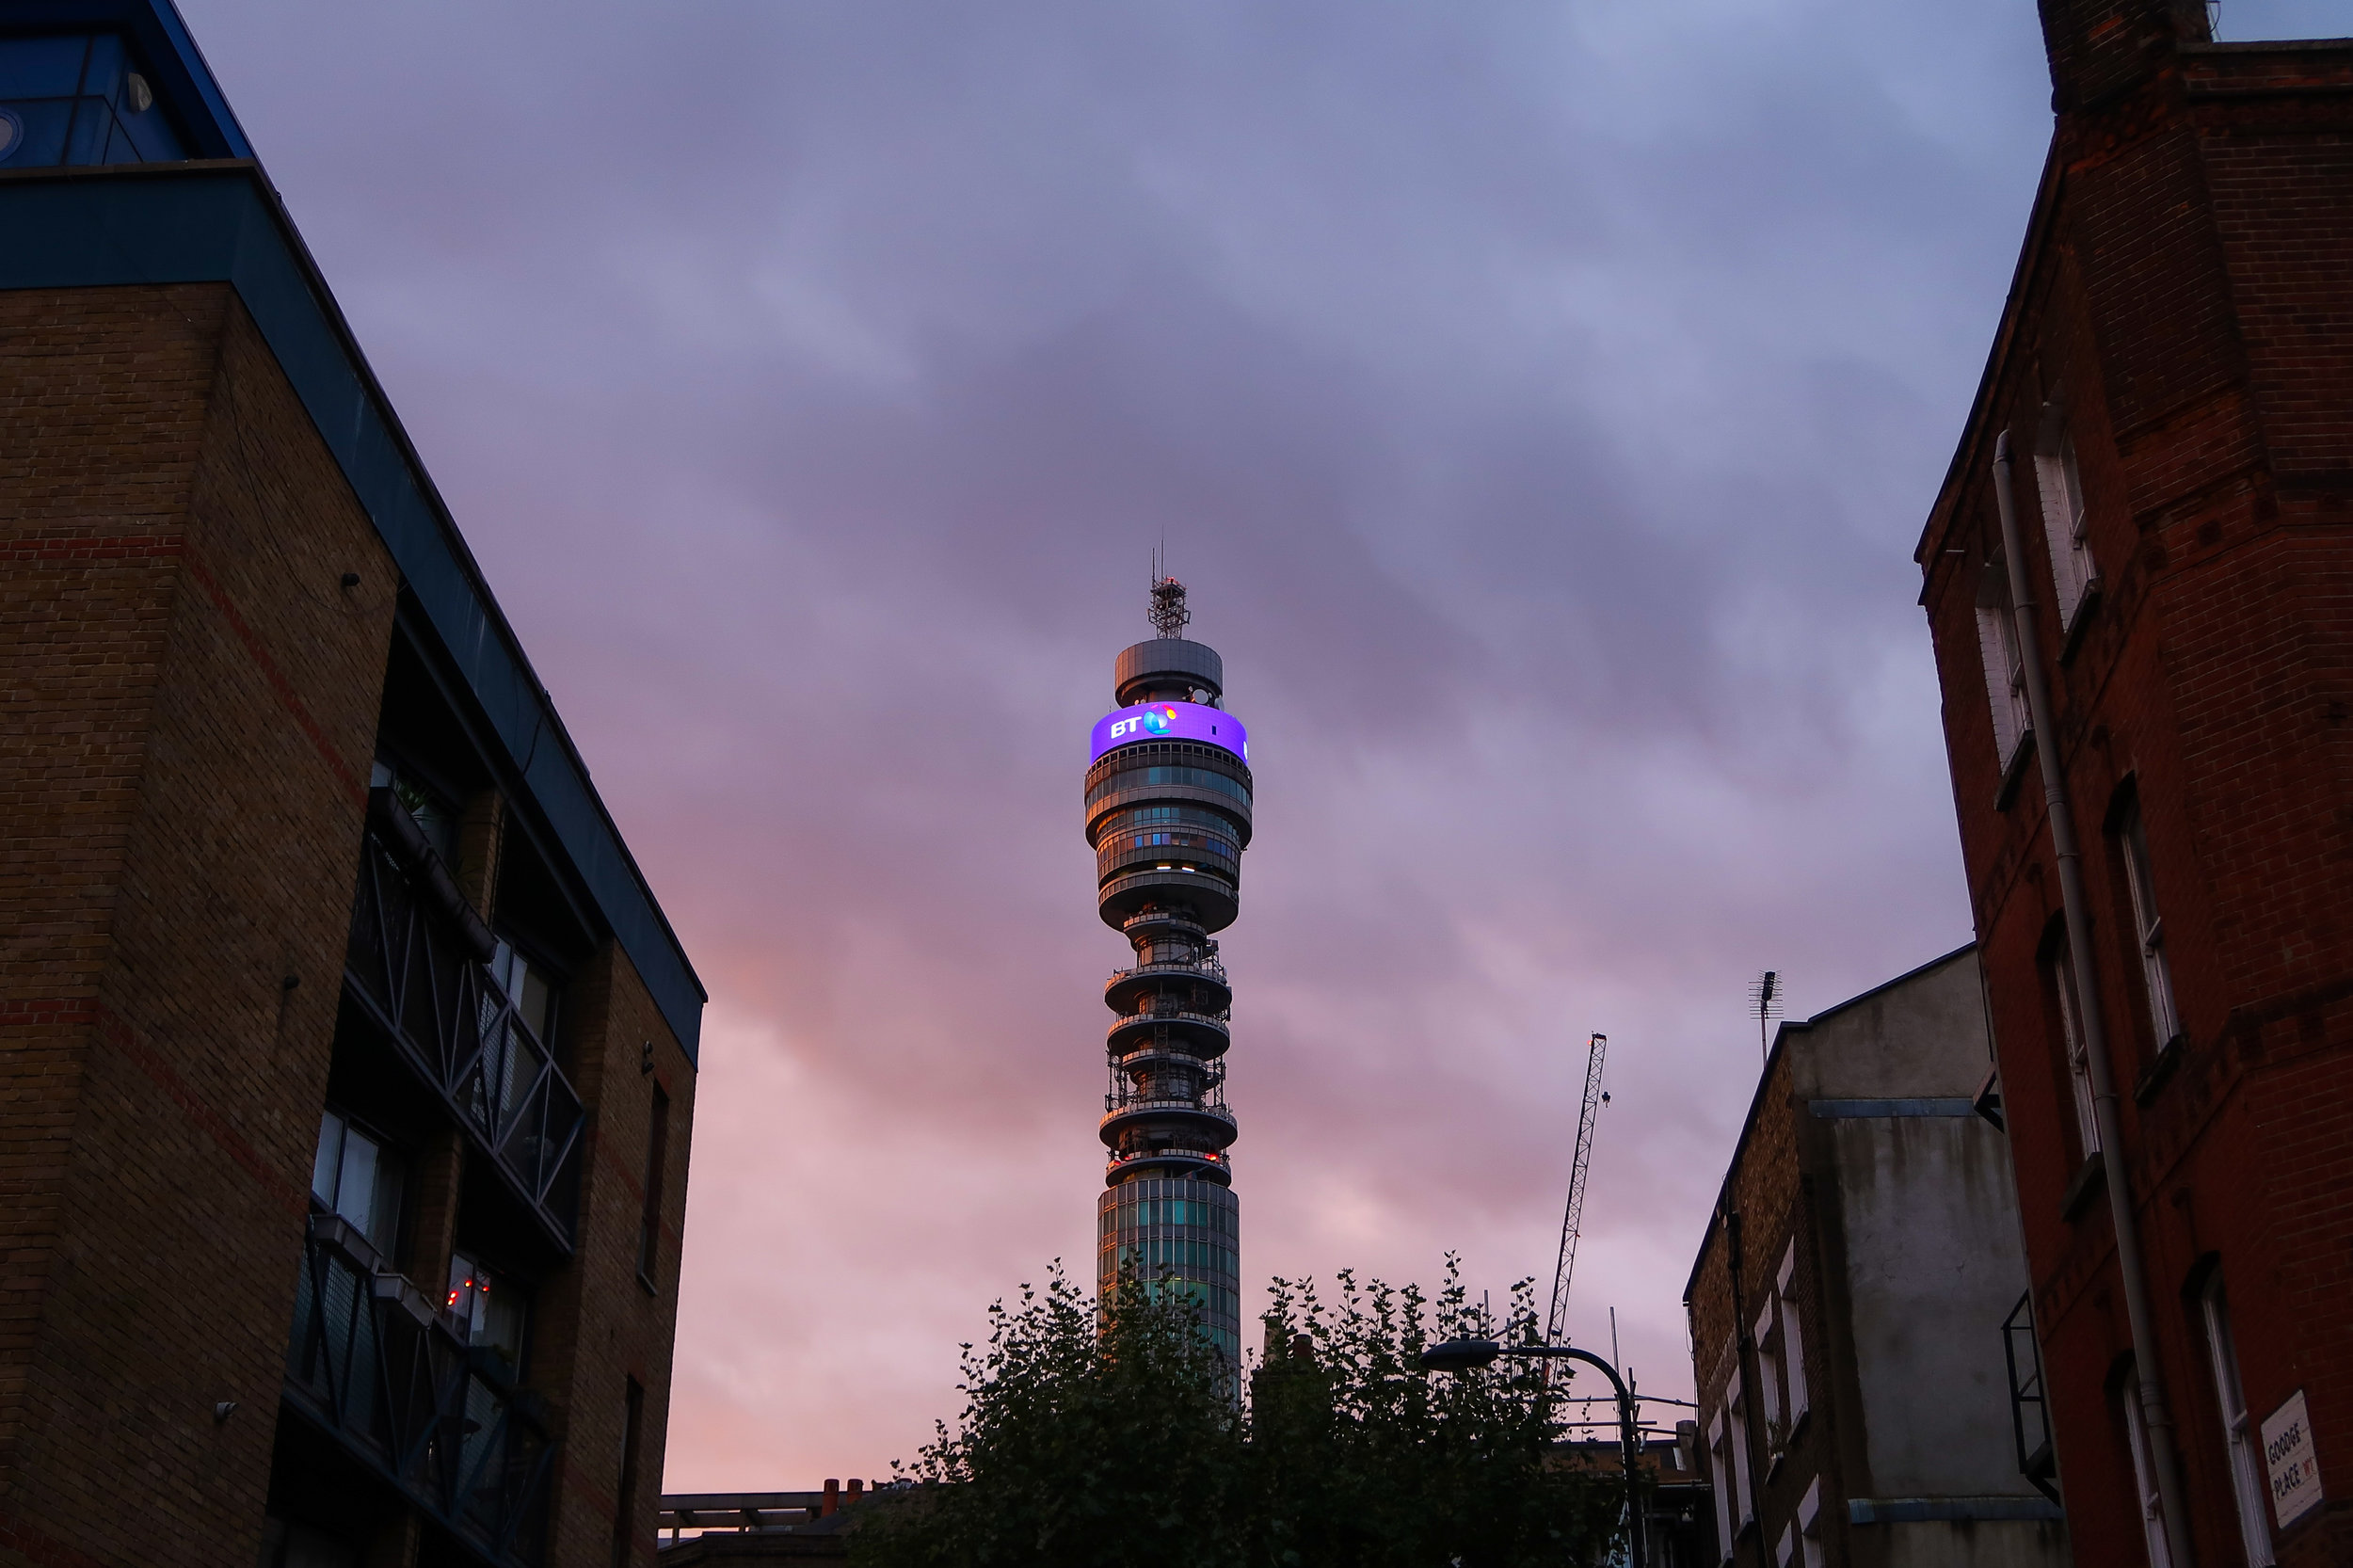 BT tower_c_Daphne Ronse